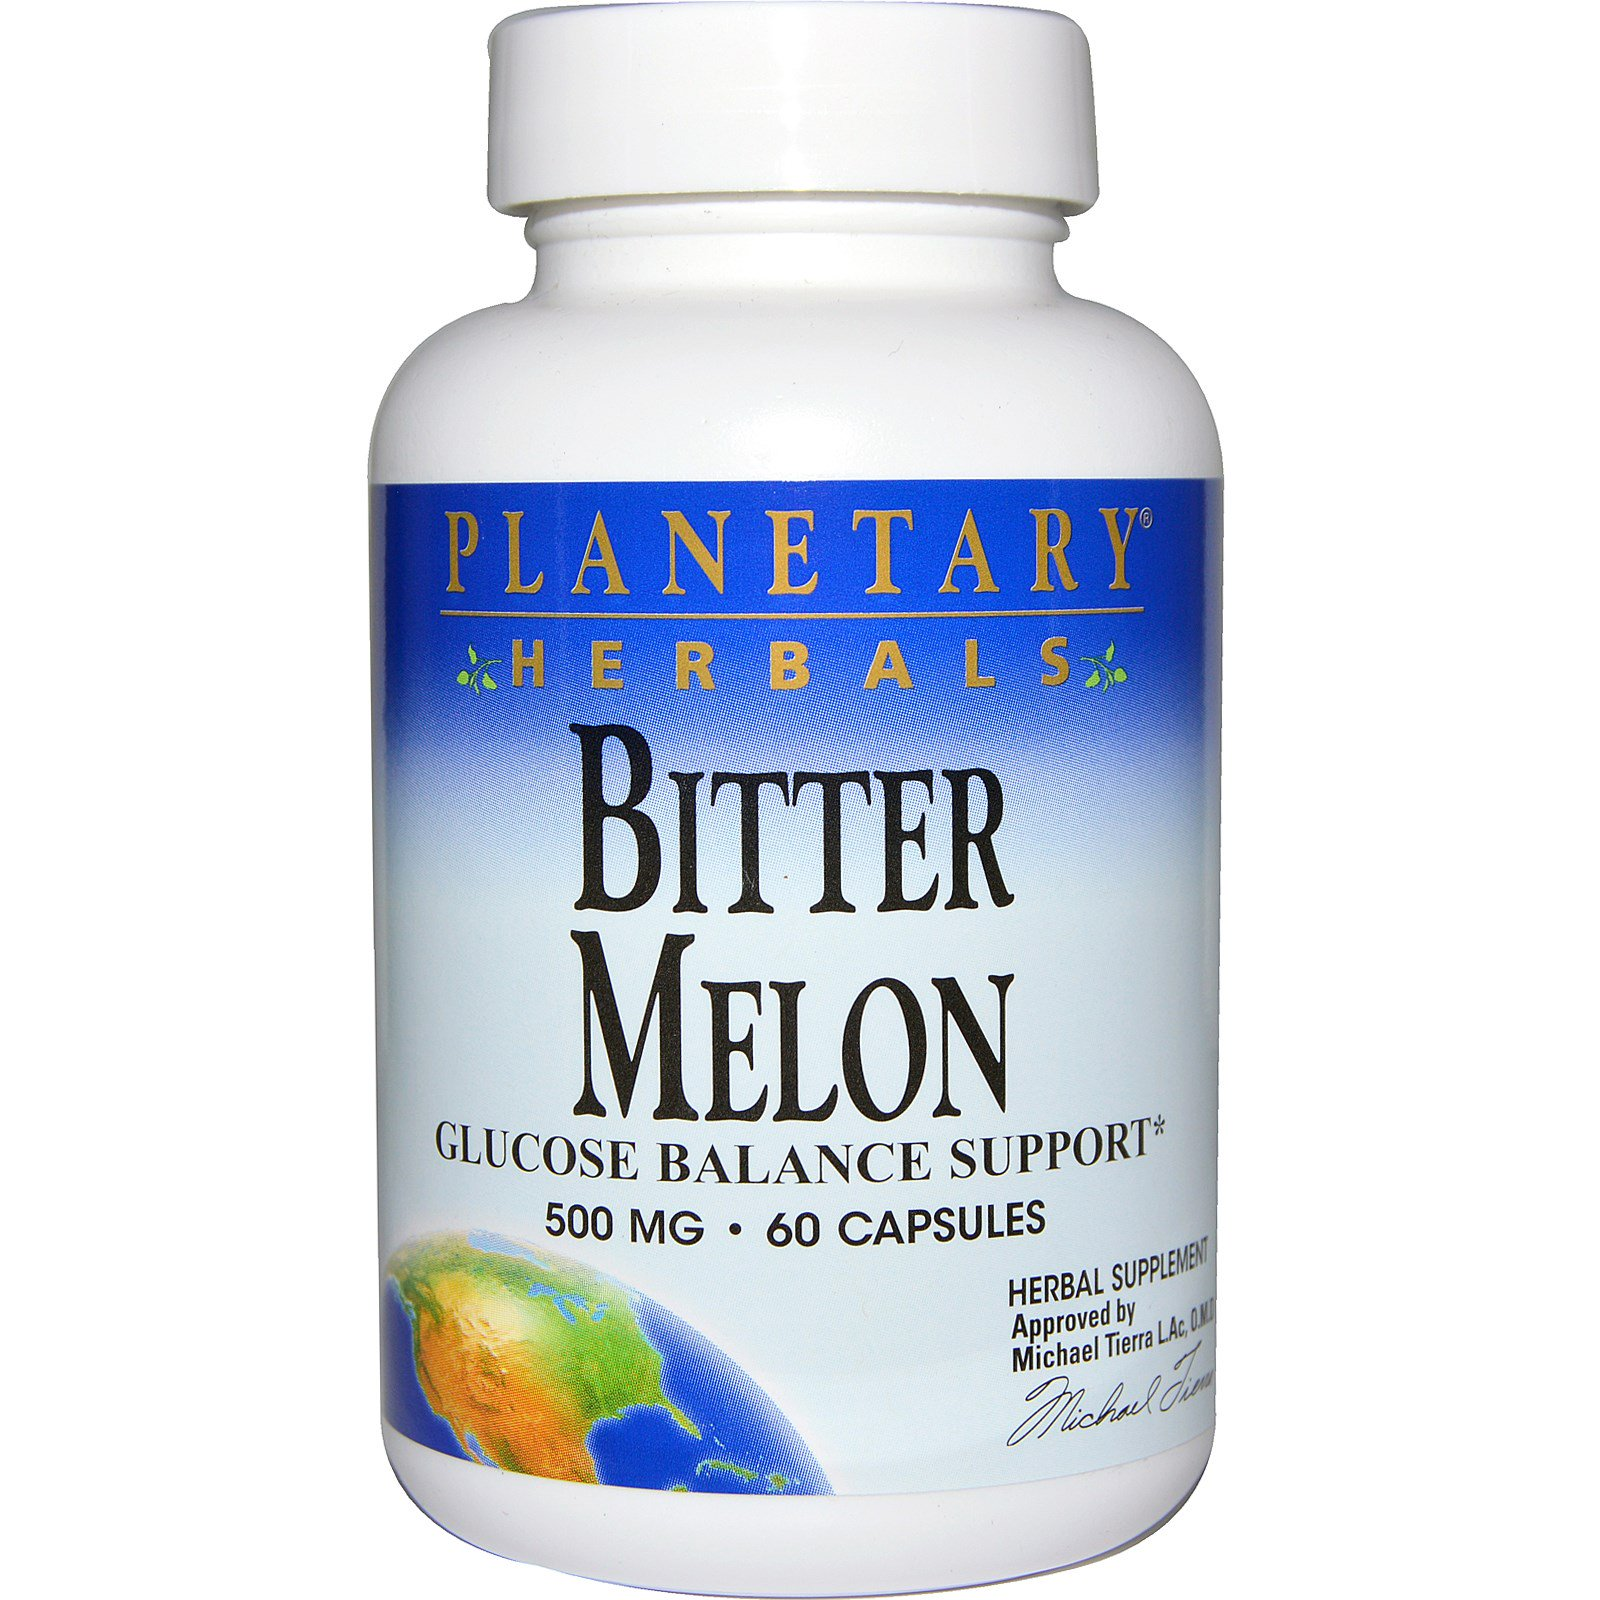 Planetary Herbals, Горькая дыня, поддержка баланса глюкозы, 500 мг, 60 капсул